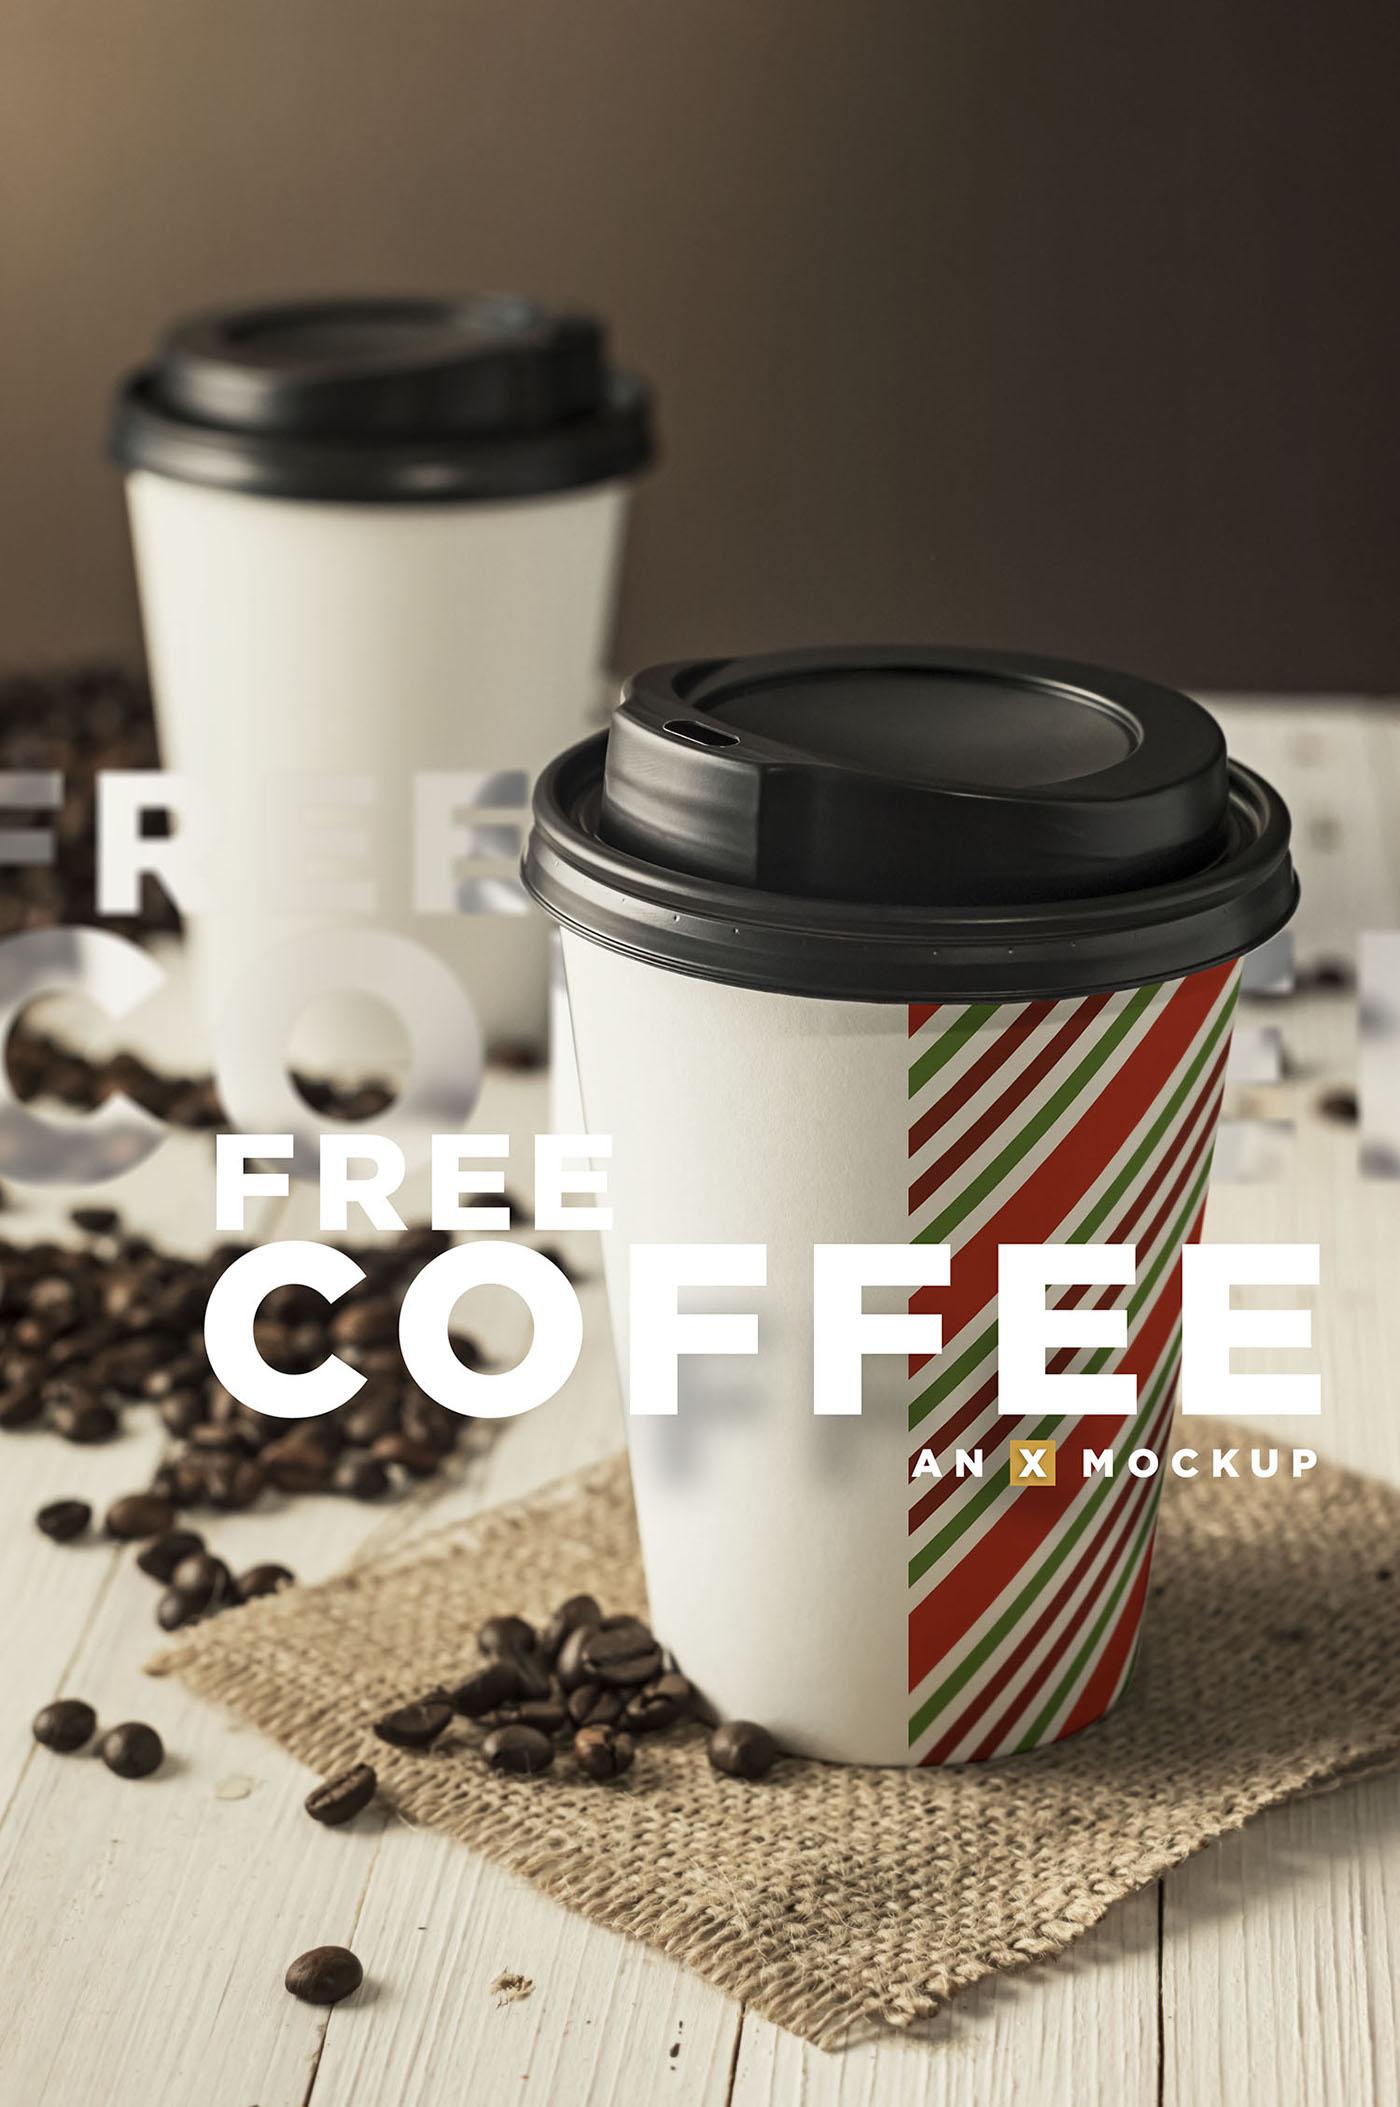 Coffee Branding Mockup Free on Behance